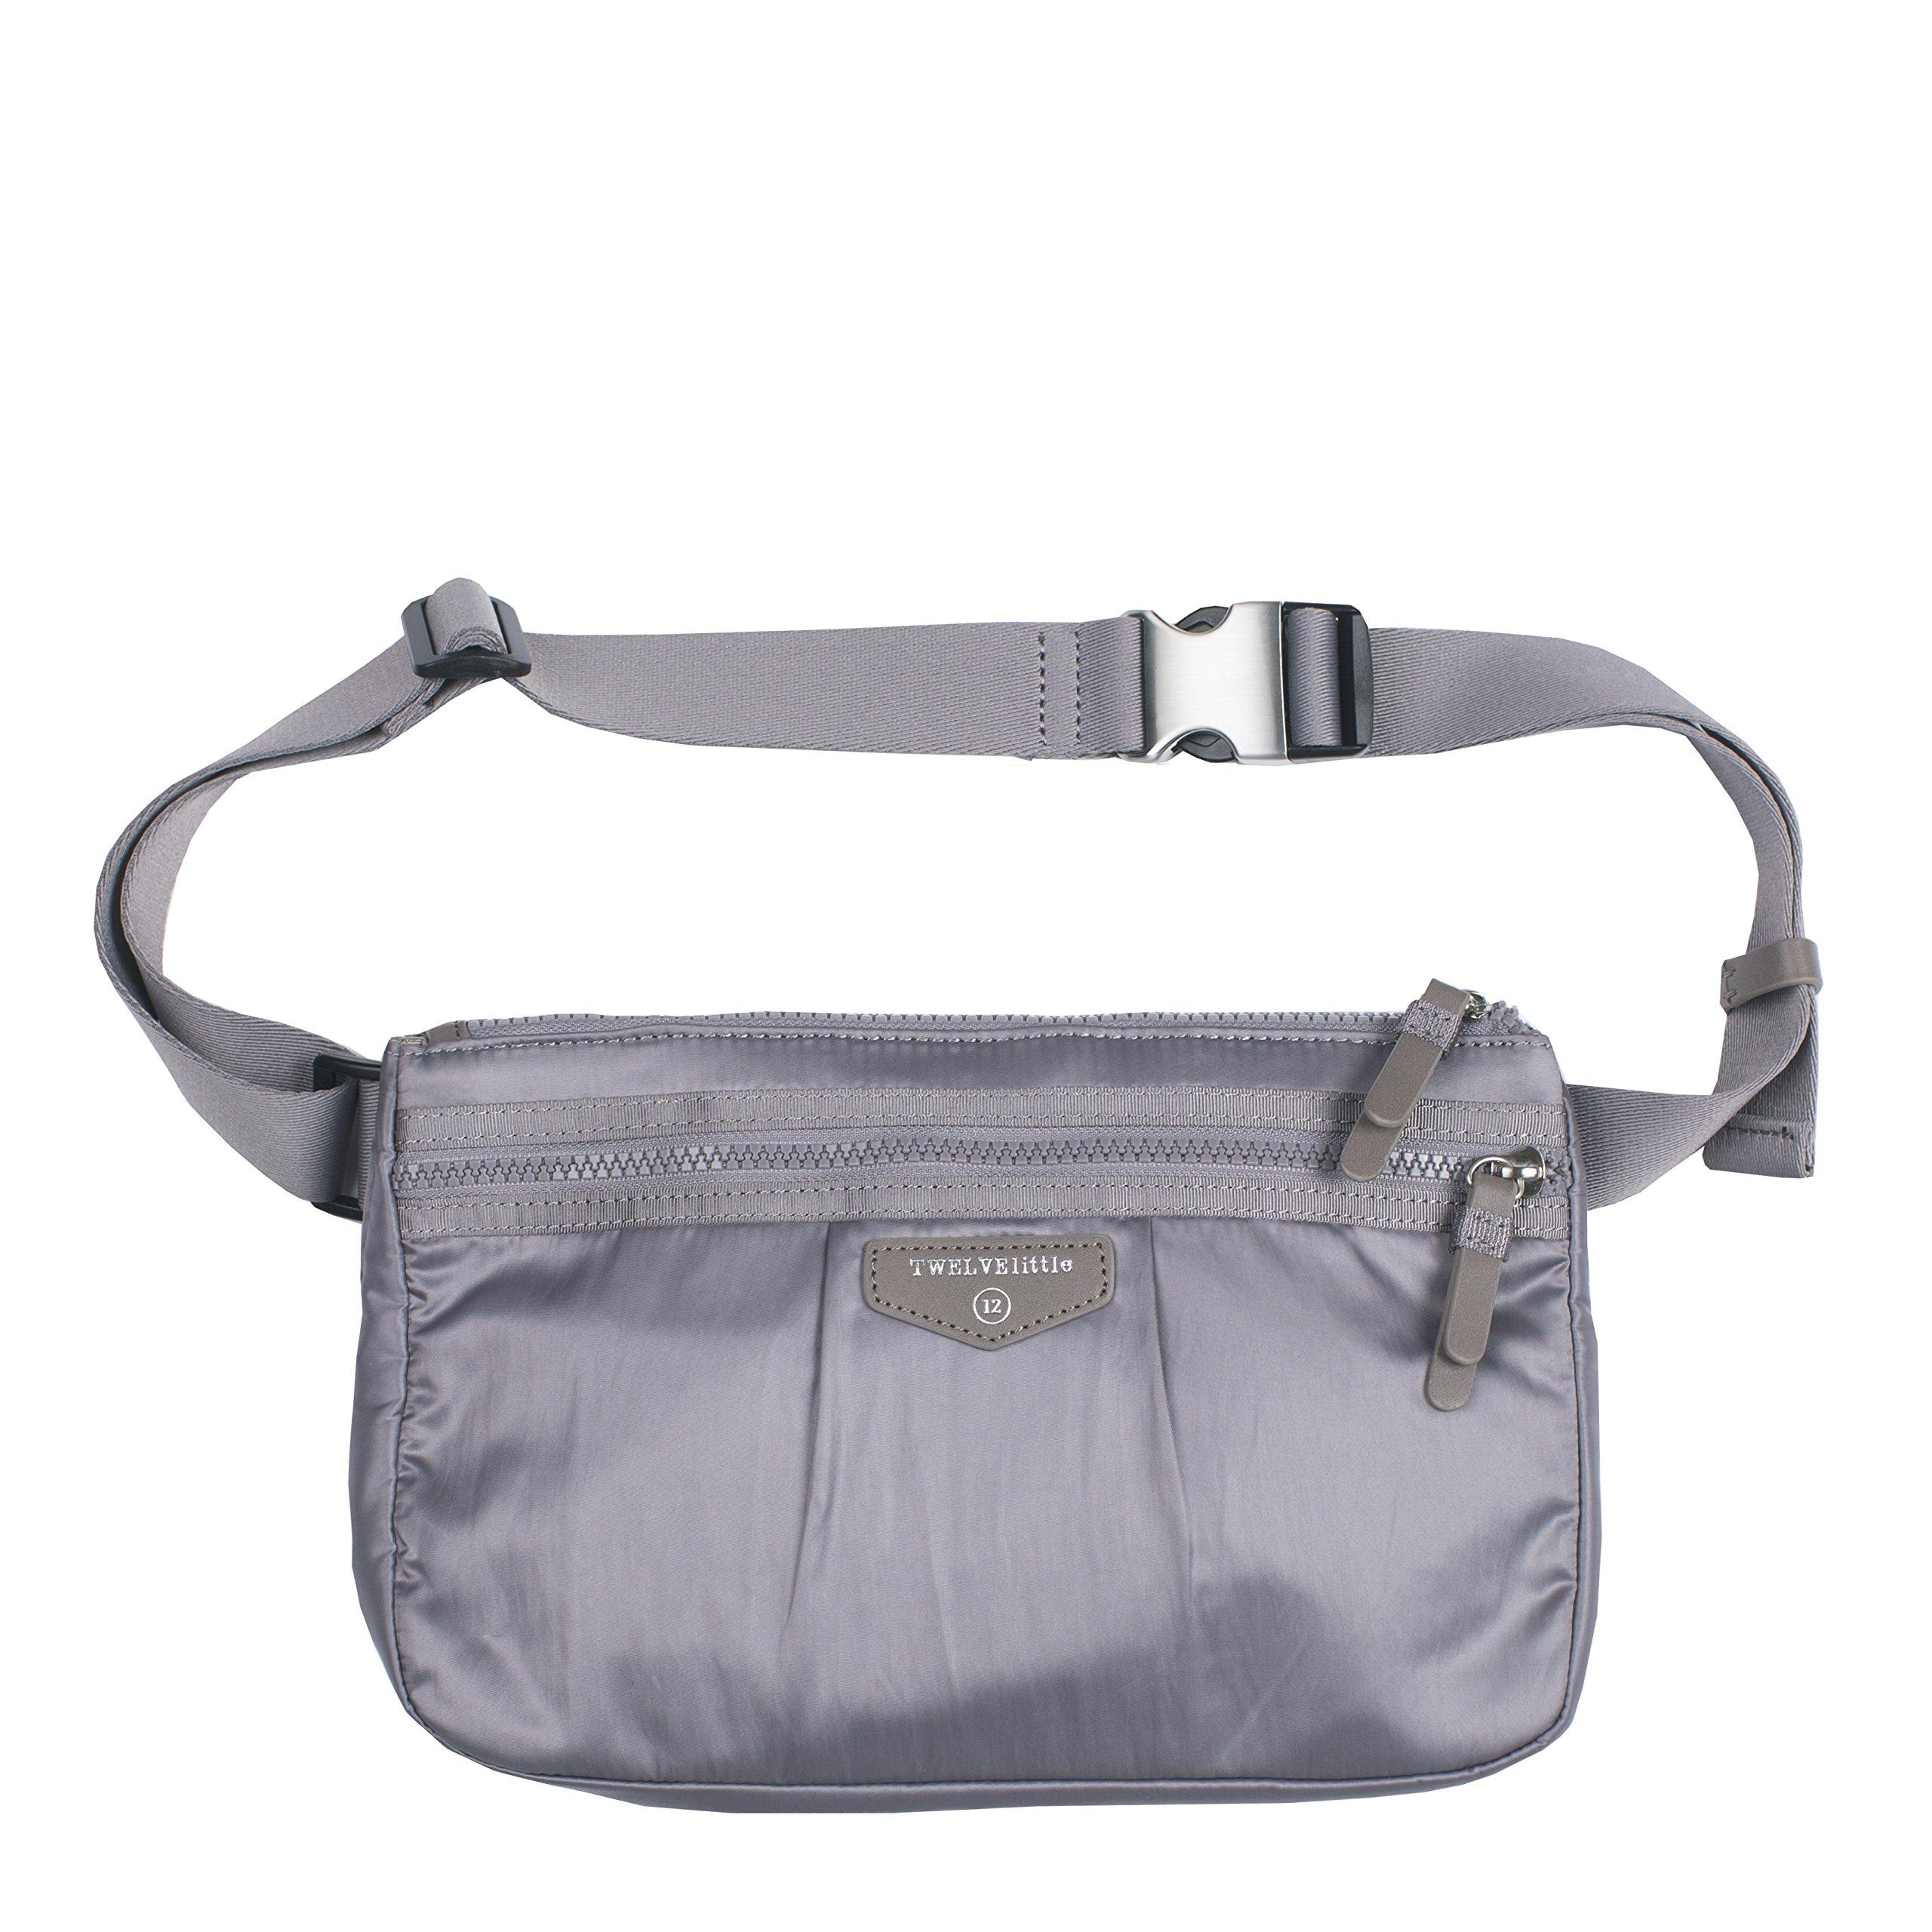 TWELVElittle Fanny Pack, Grey